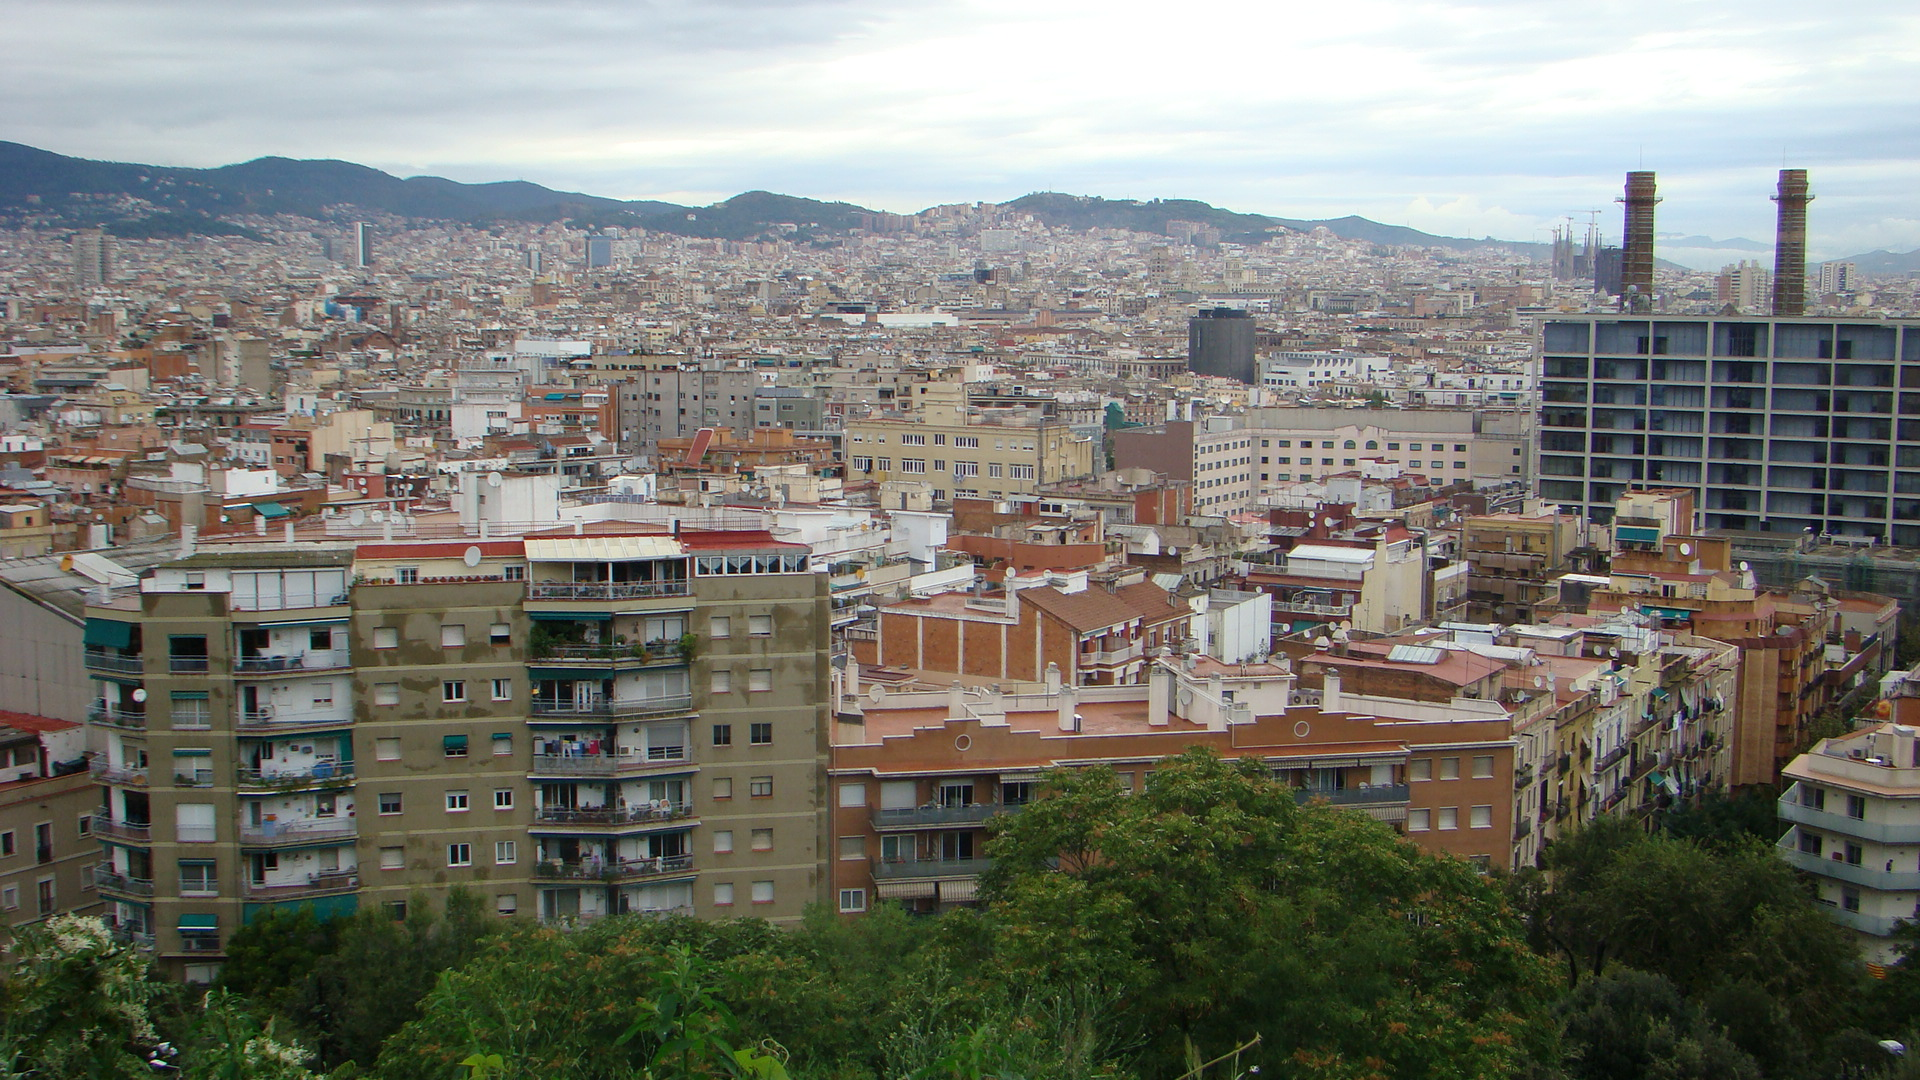 Hotel de jardi doug solter for Hotel jardi barcelona